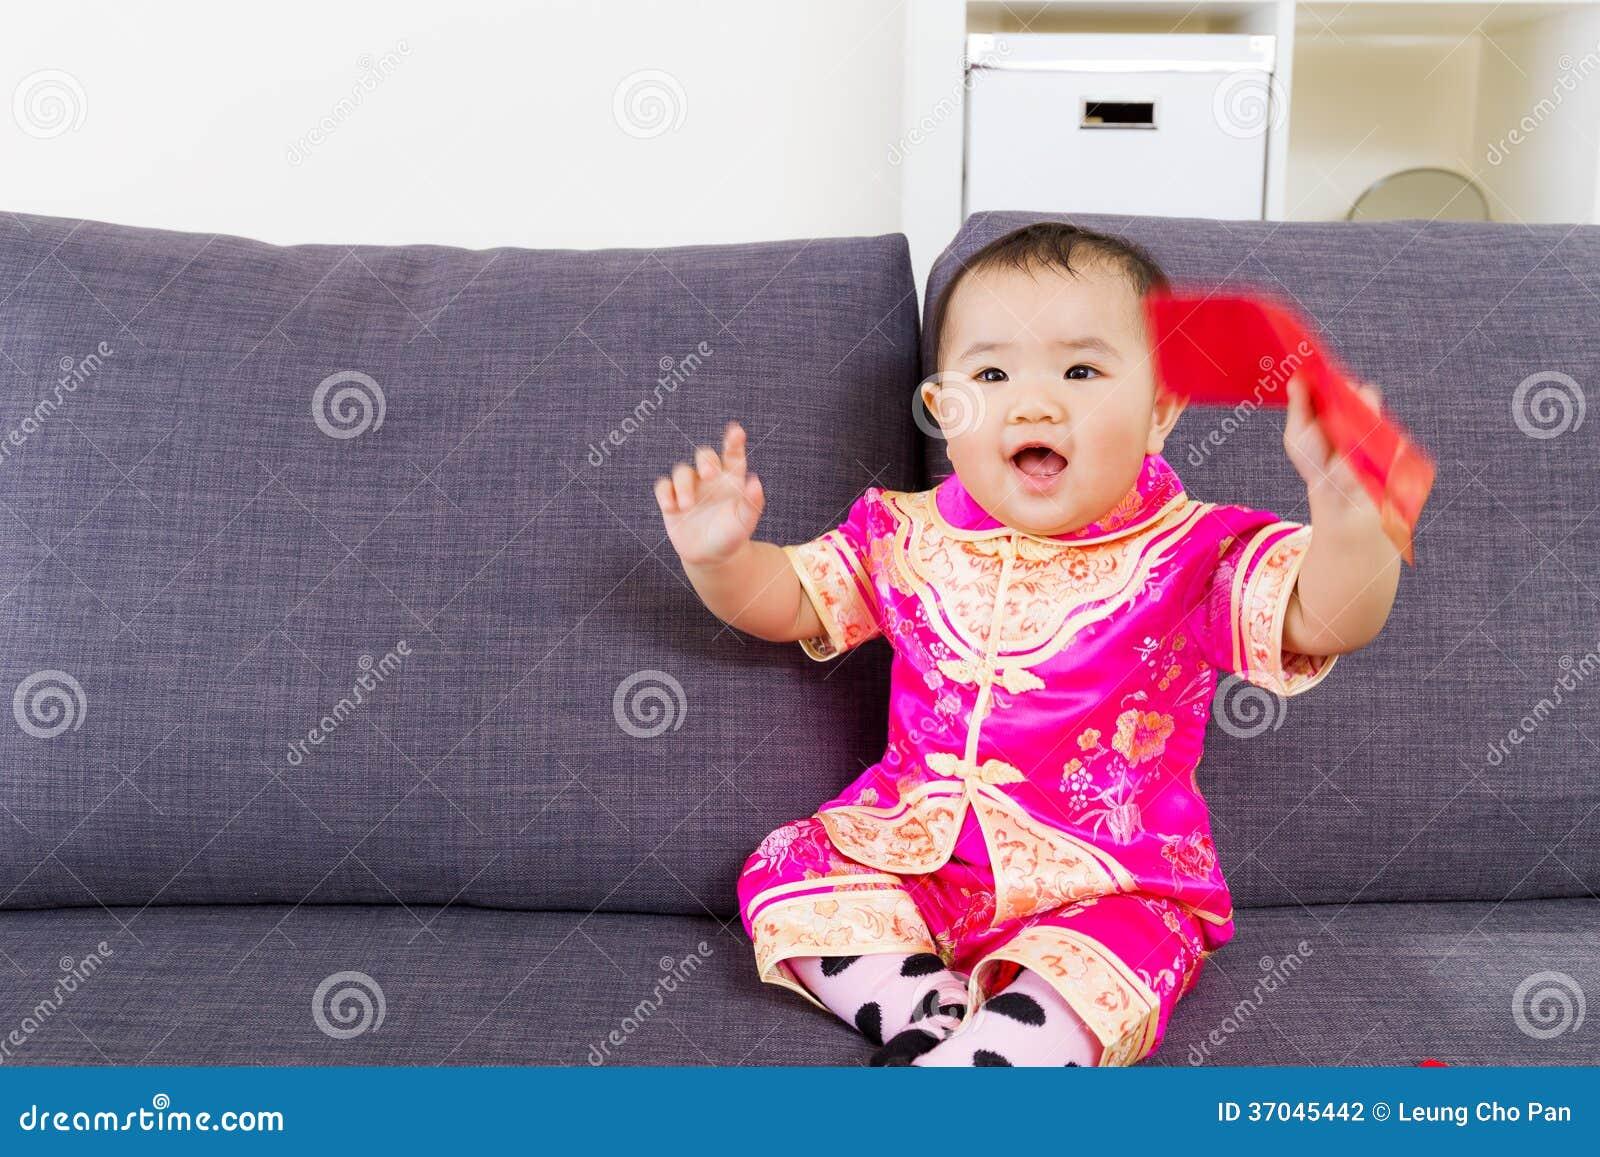 Aziatische baby die rode zak met traditionele Chinese kleding houden